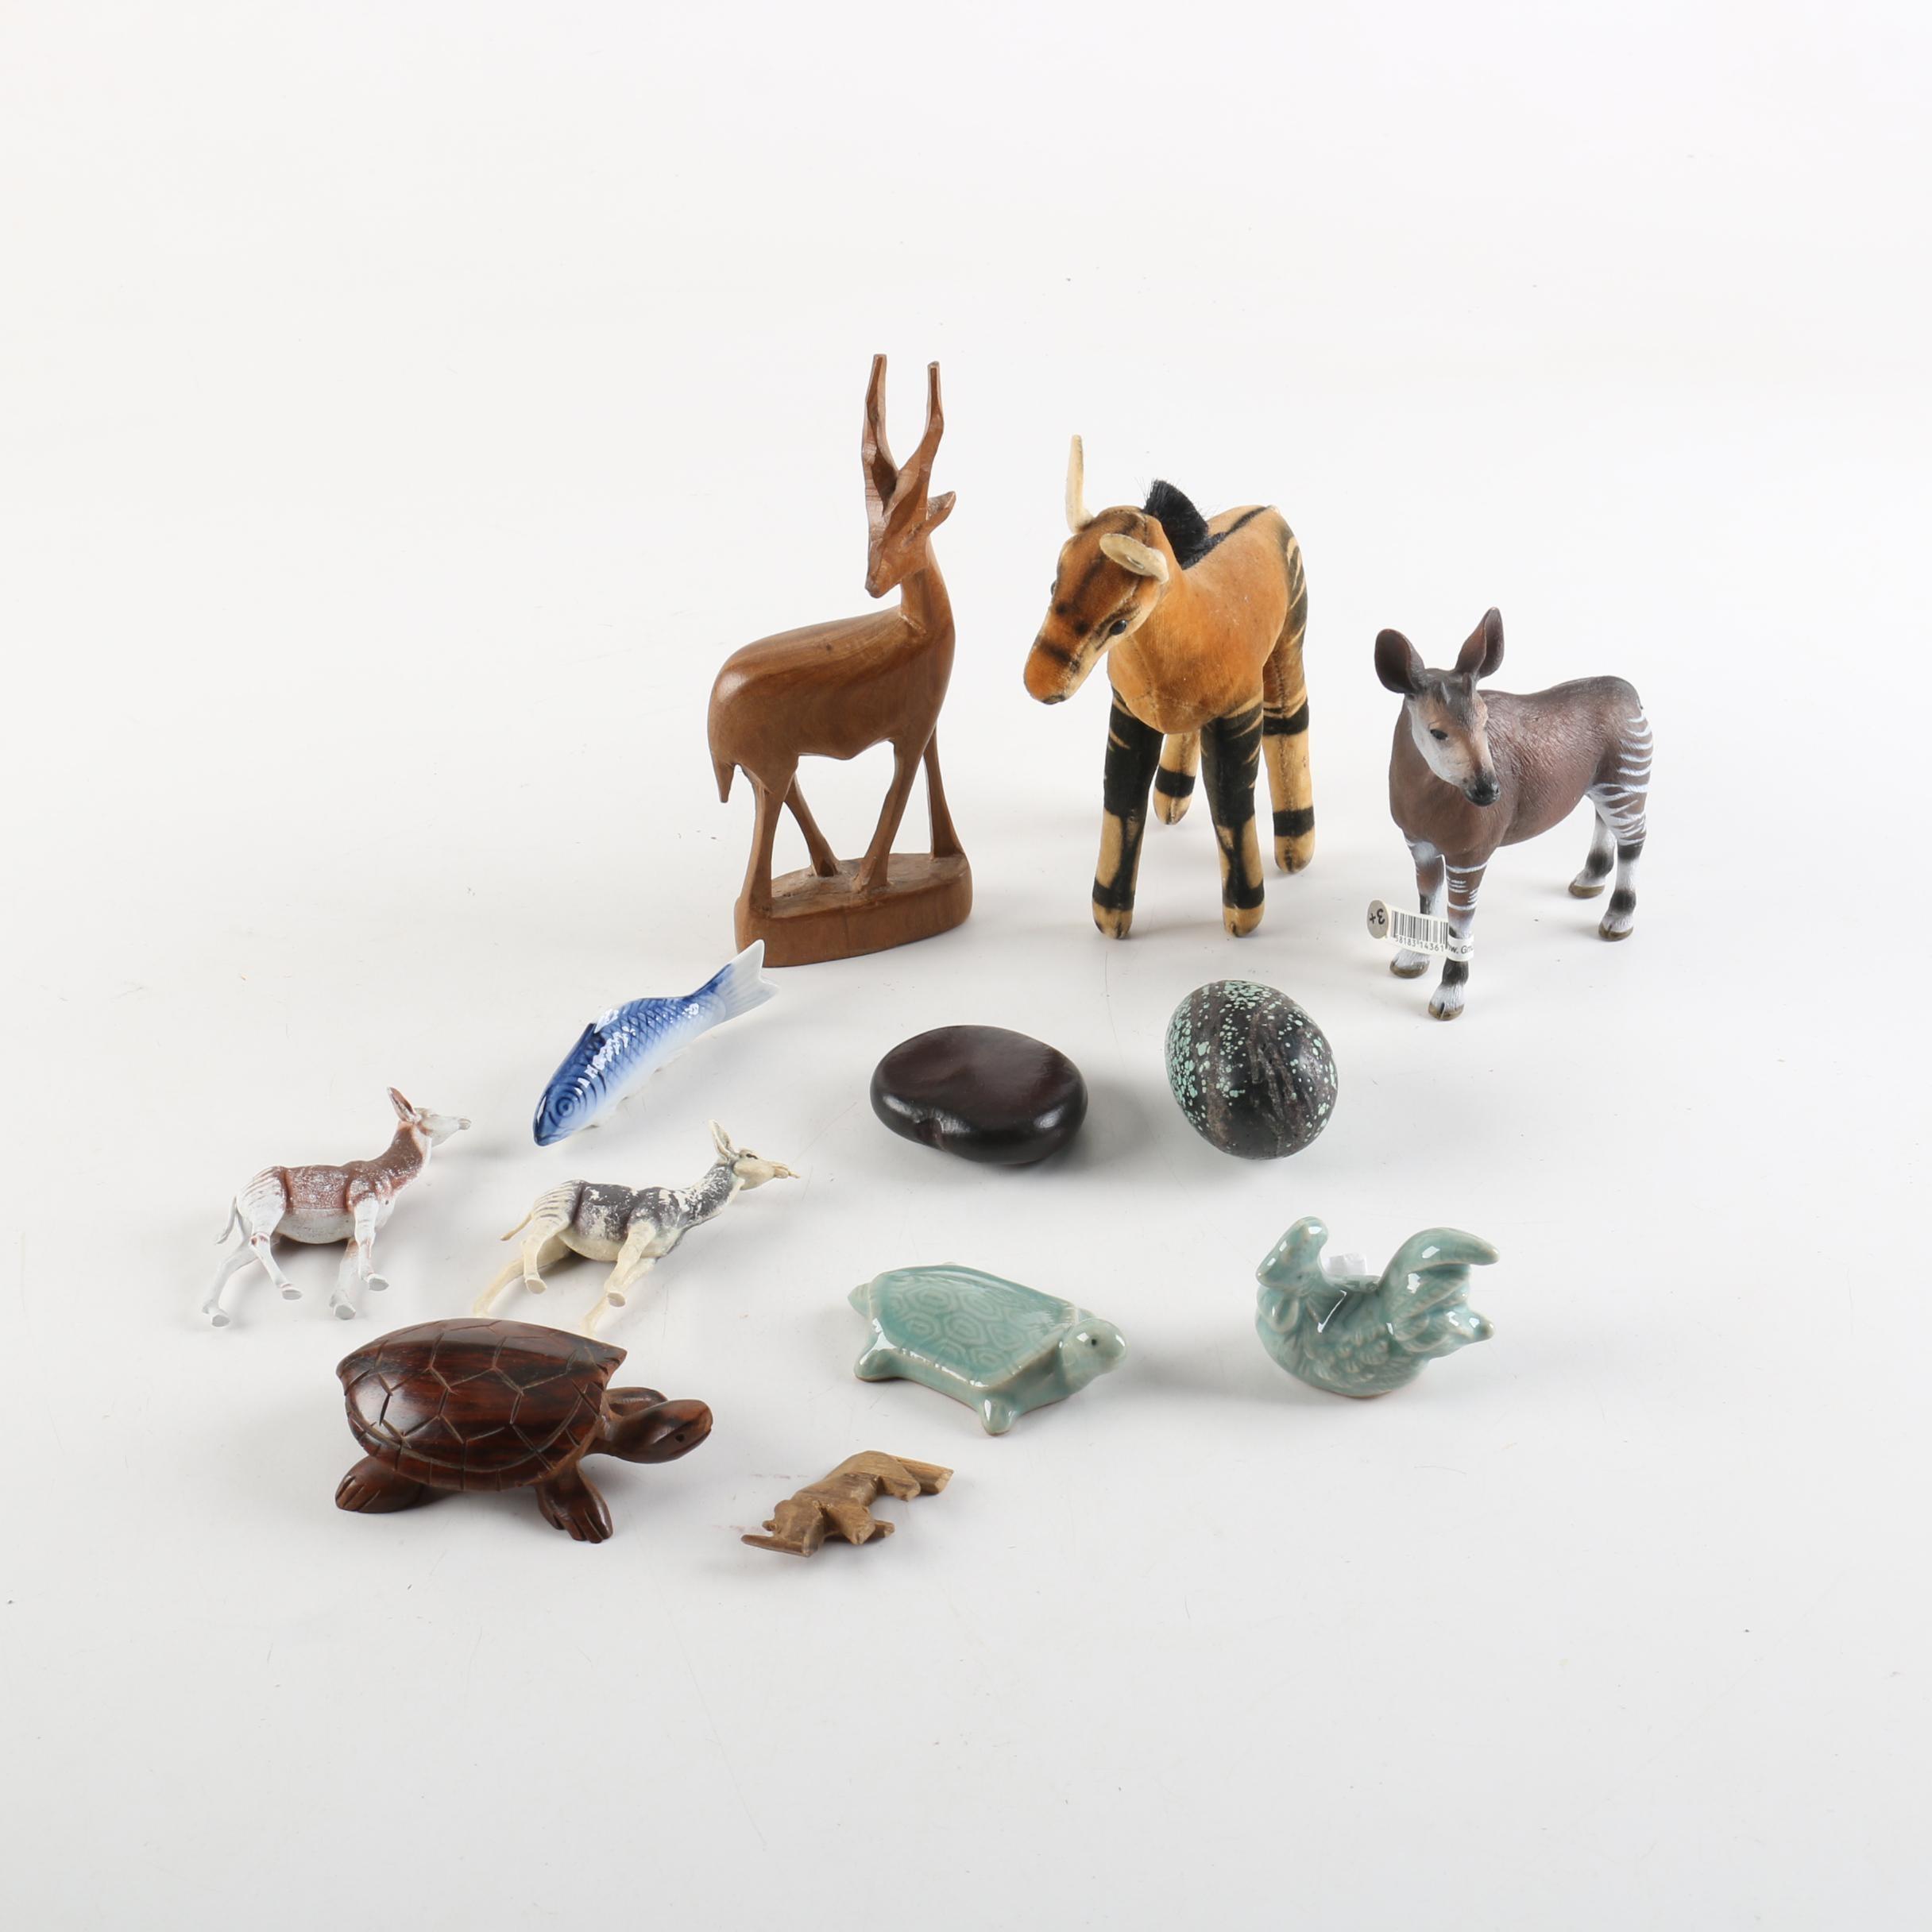 Animal Figurines and Miniatures